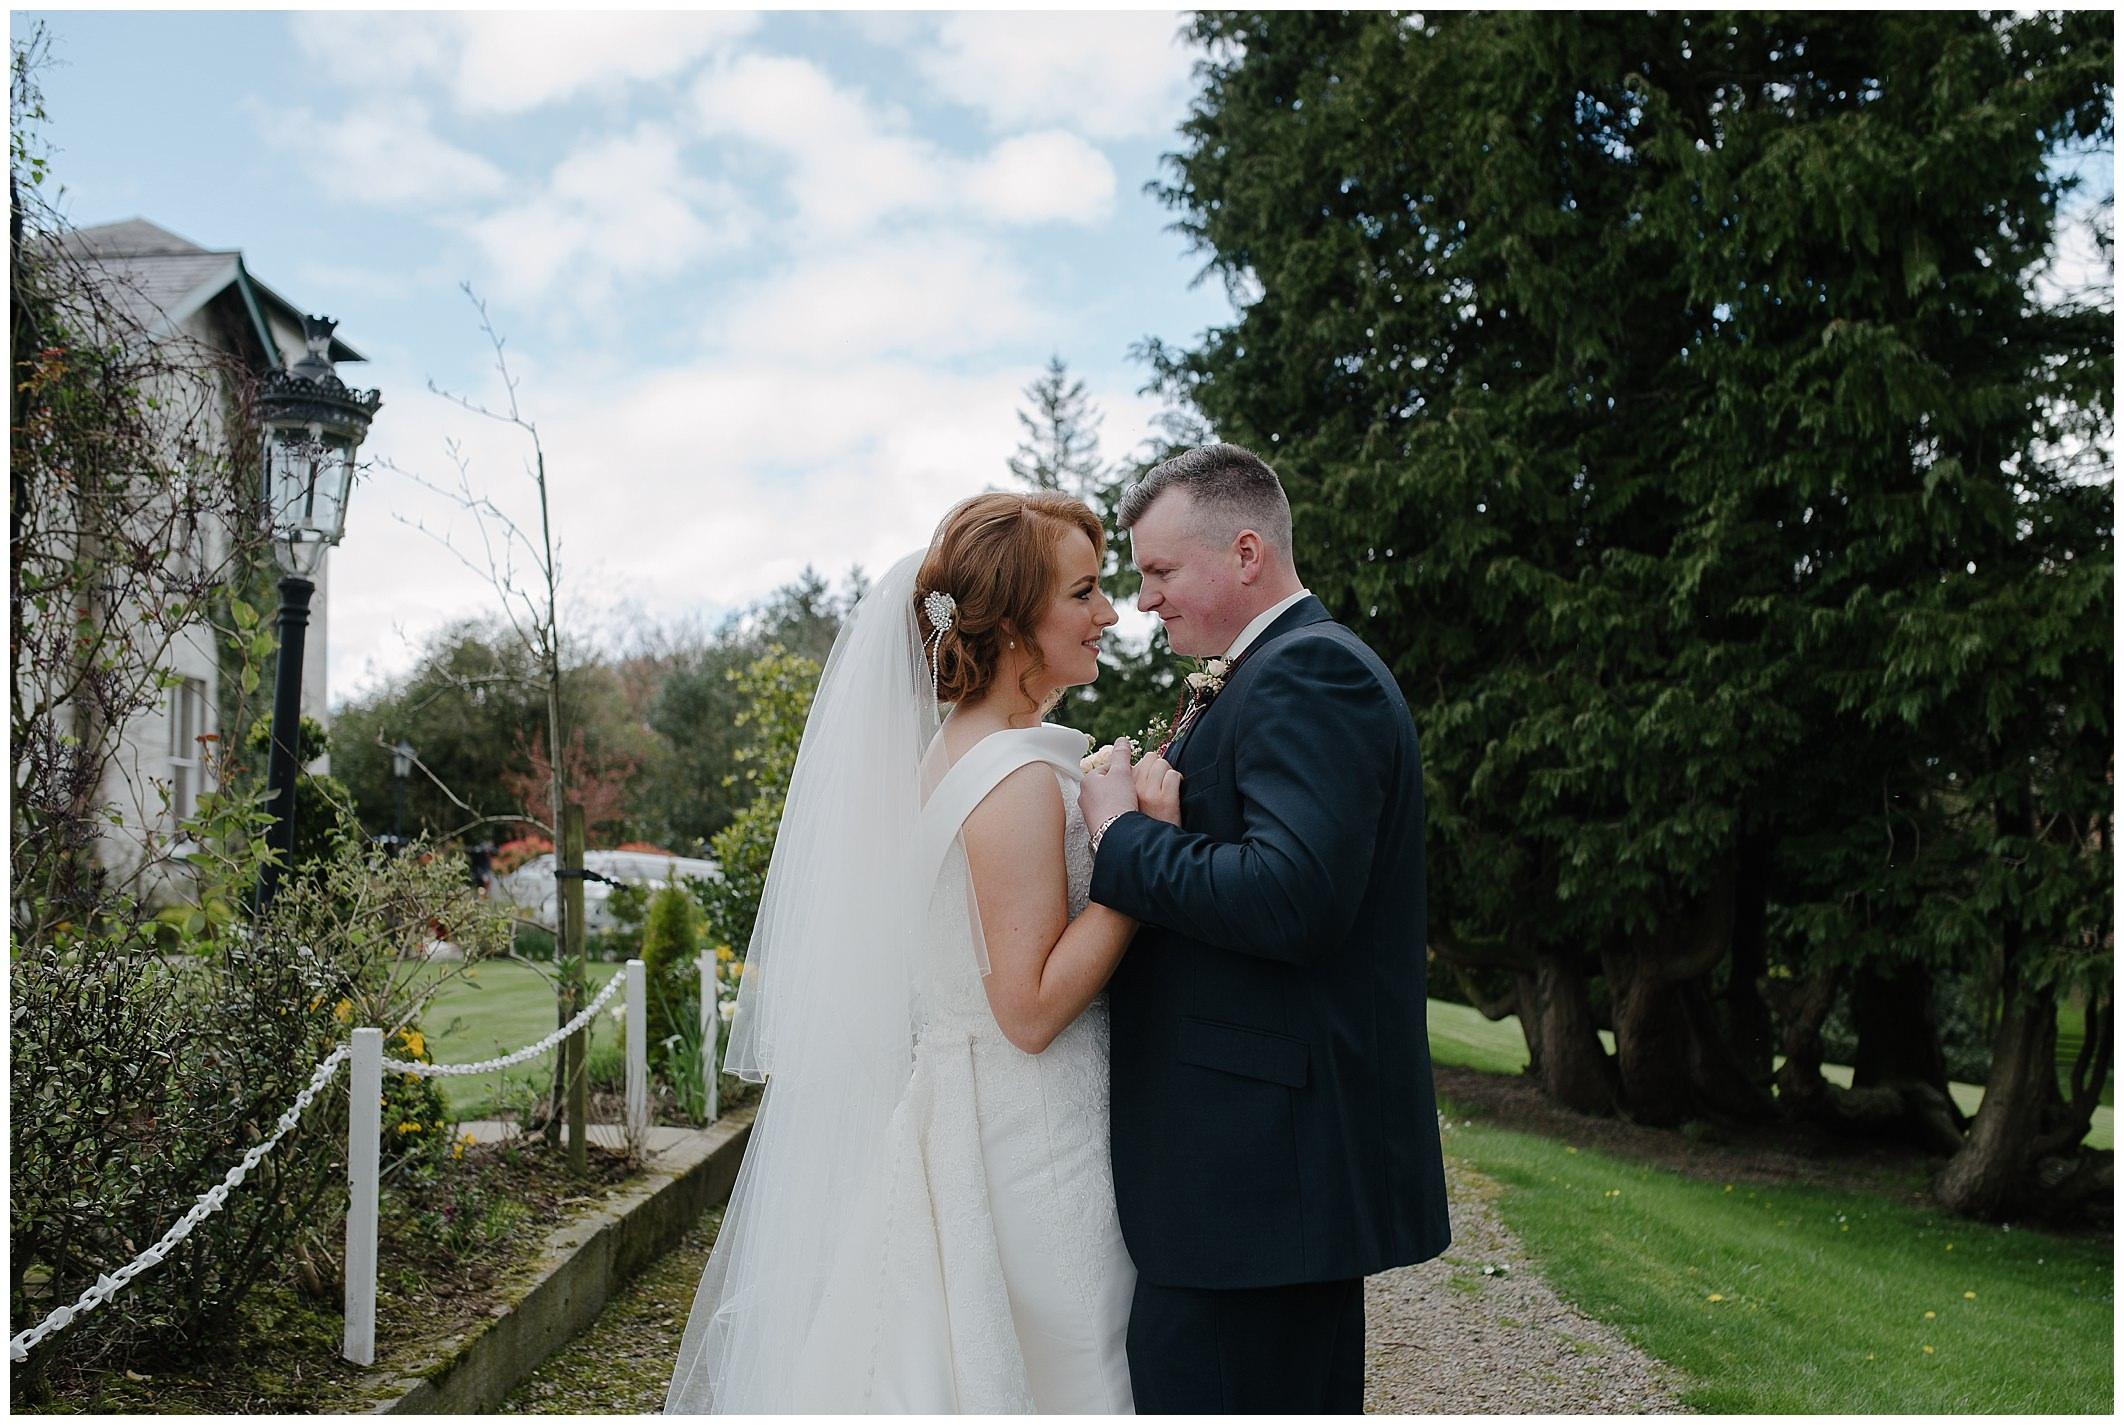 corick-house-wedding-hannah-gary-jude-browne-photography_0054.jpg